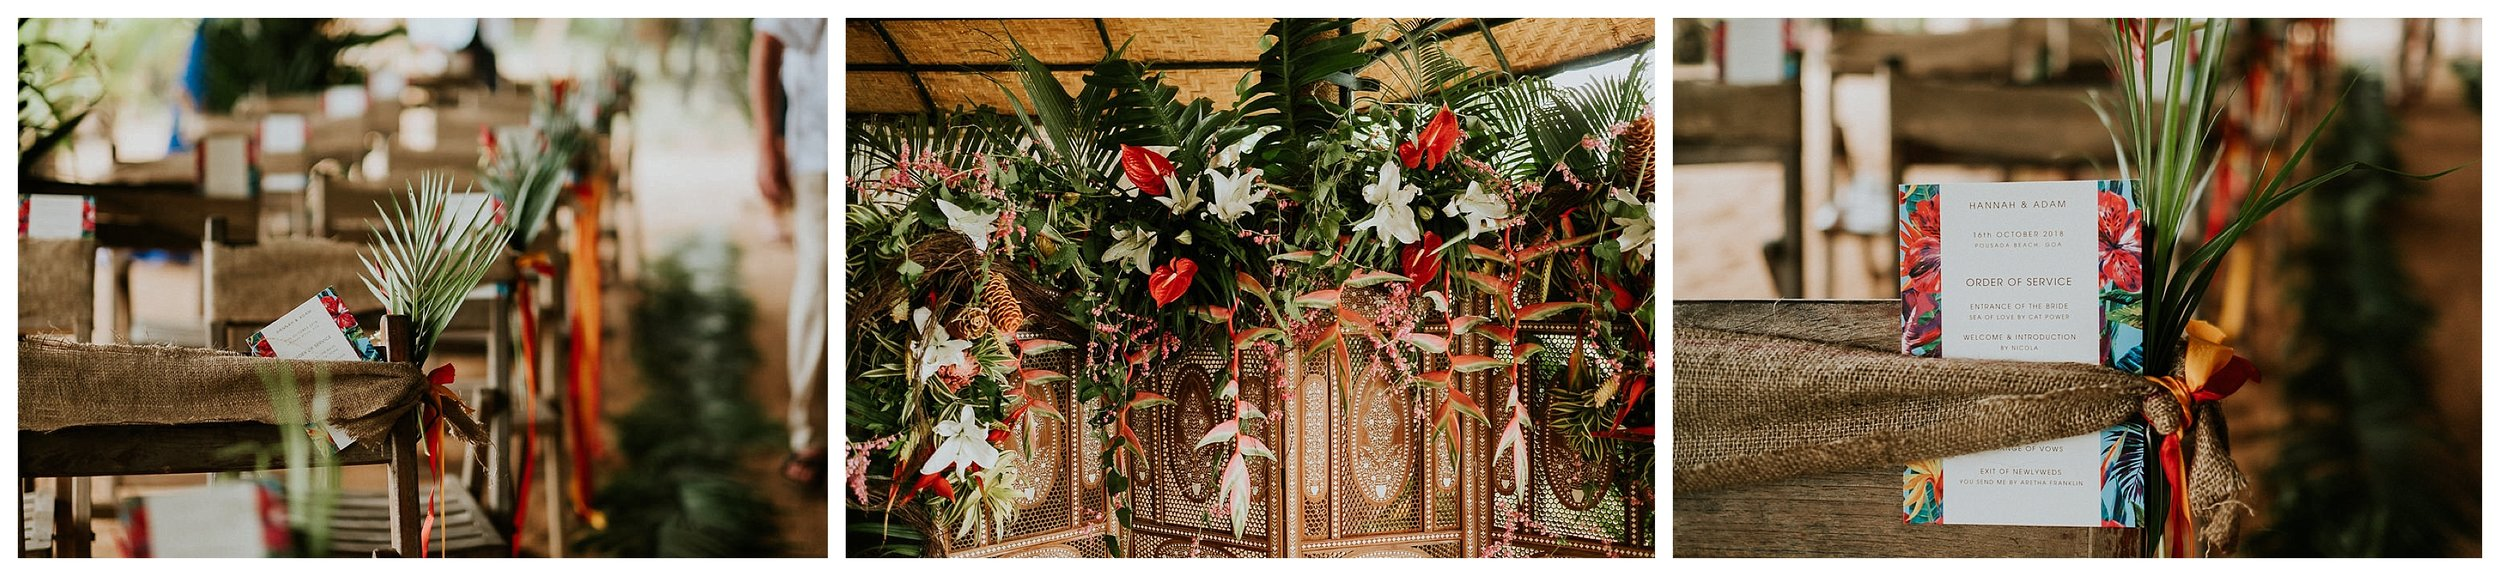 Goa Destination Wedding Photographer India Colouful Fun Joanna Nicole Photography Coco Shambhala9.jpg